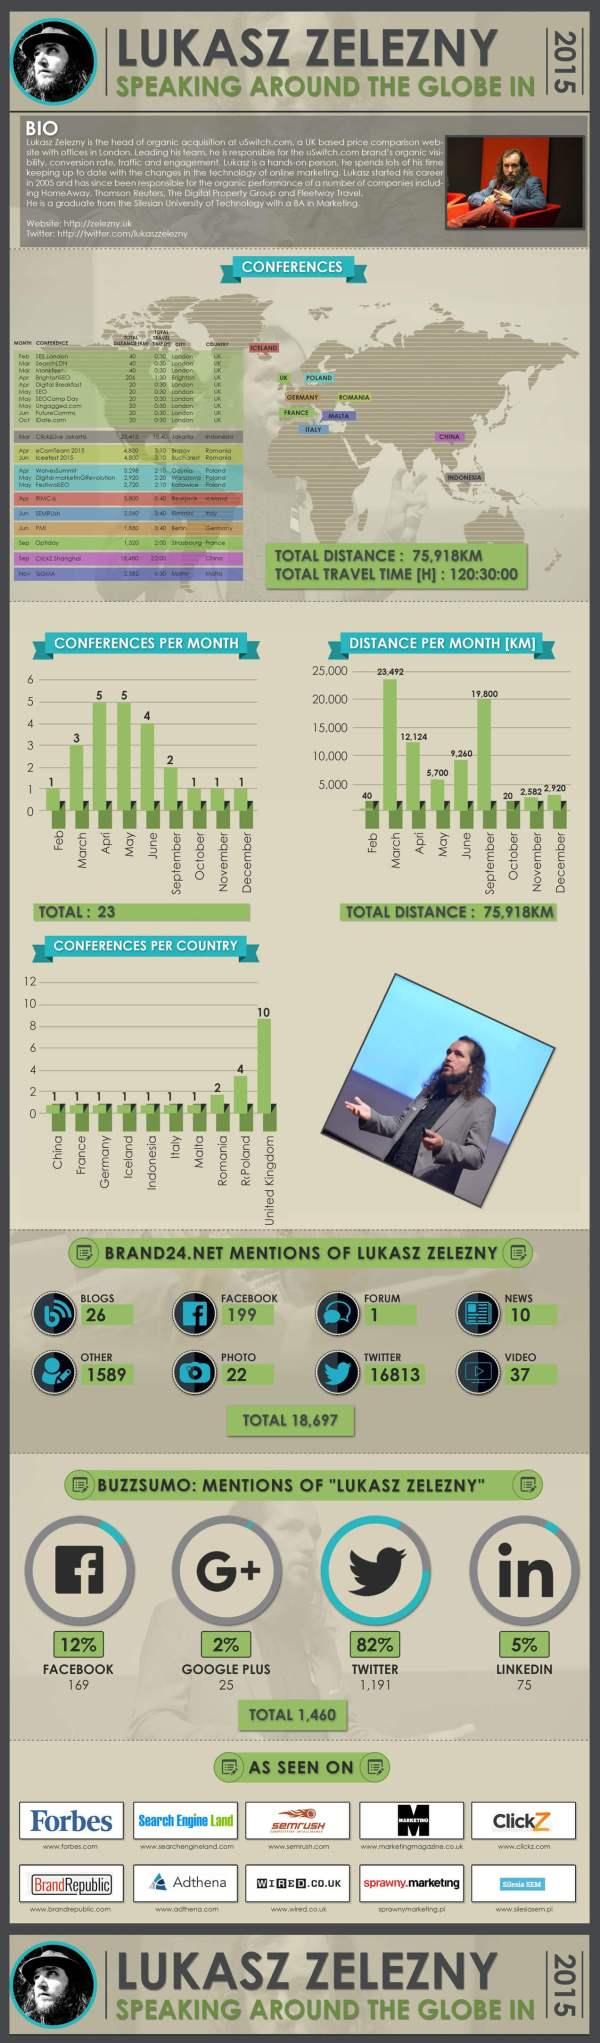 LukaszZelezny-Speaking-Around-The-Globe-Conferences-2015-Infographic1